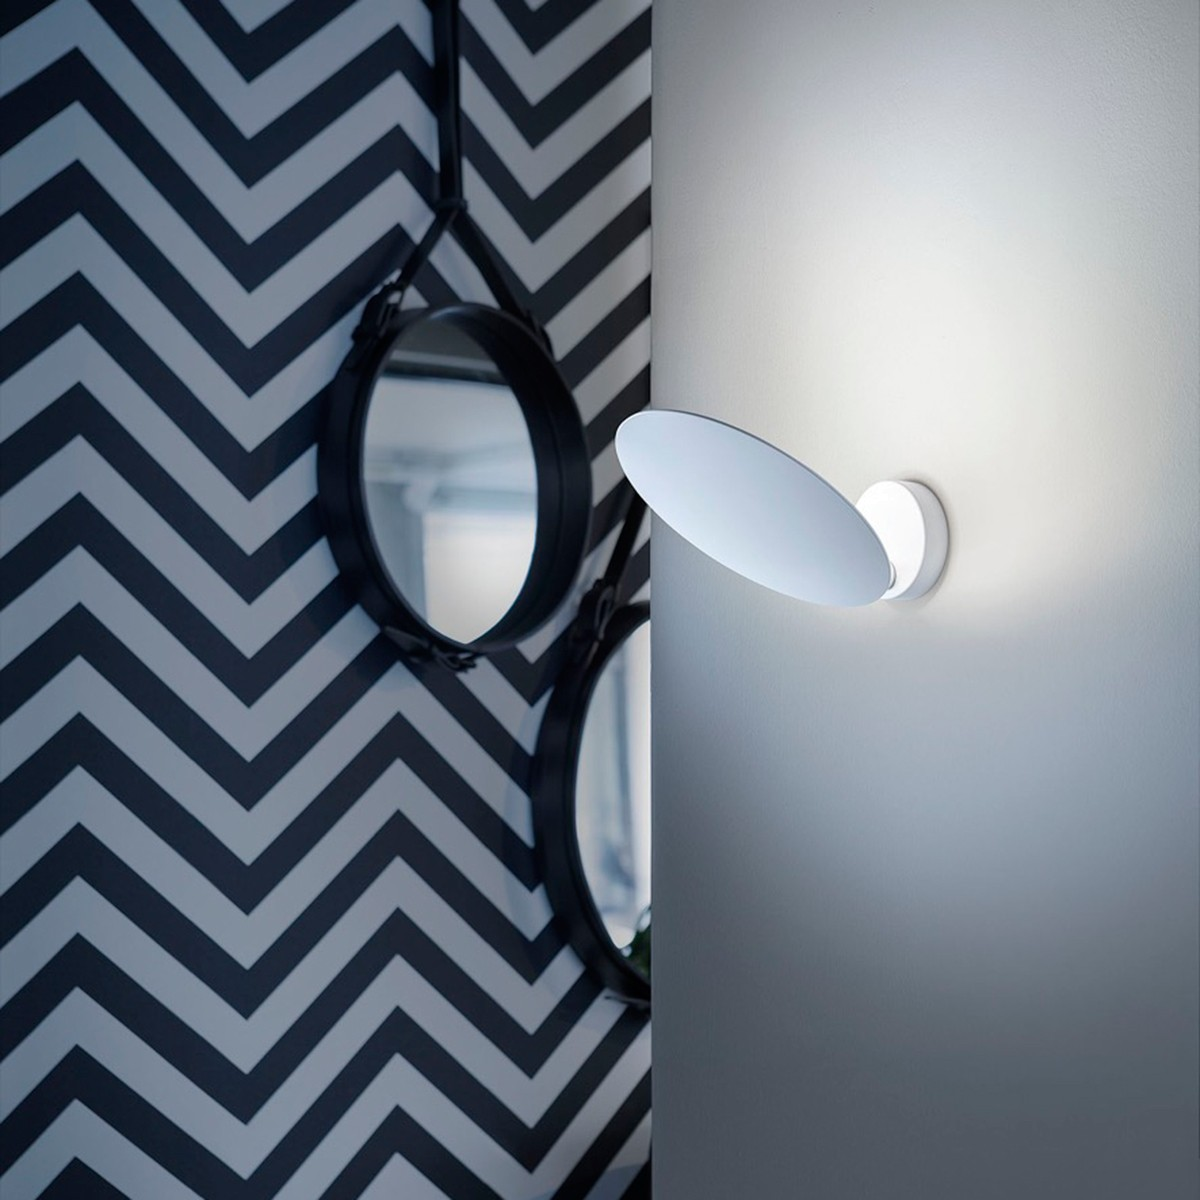 Studio Italia Design Puzzle Single Round Wandleuchte, weiß matt, 2700° K